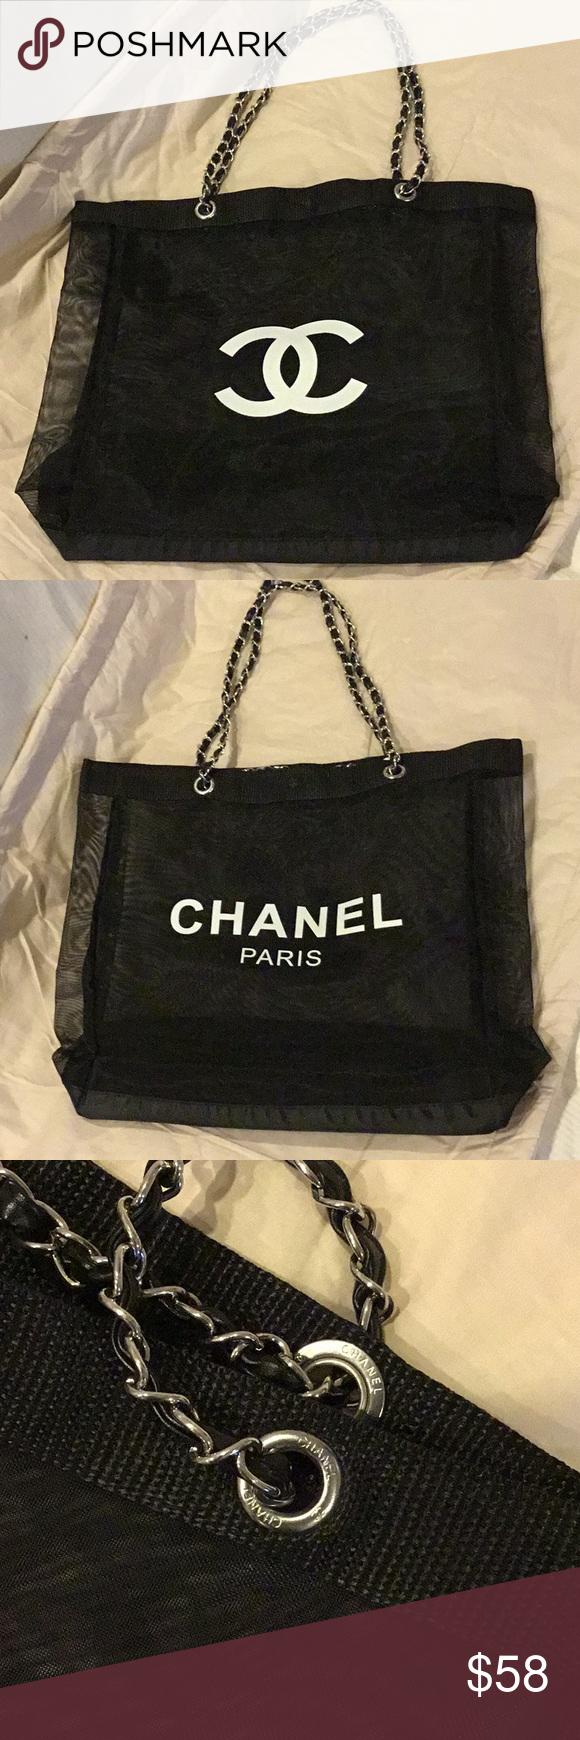 806071081085 Chanel VIP Mesh Tote Chain Bag Brand New Chanel VIP Gift Black Mesh Tote Bag  Shopping